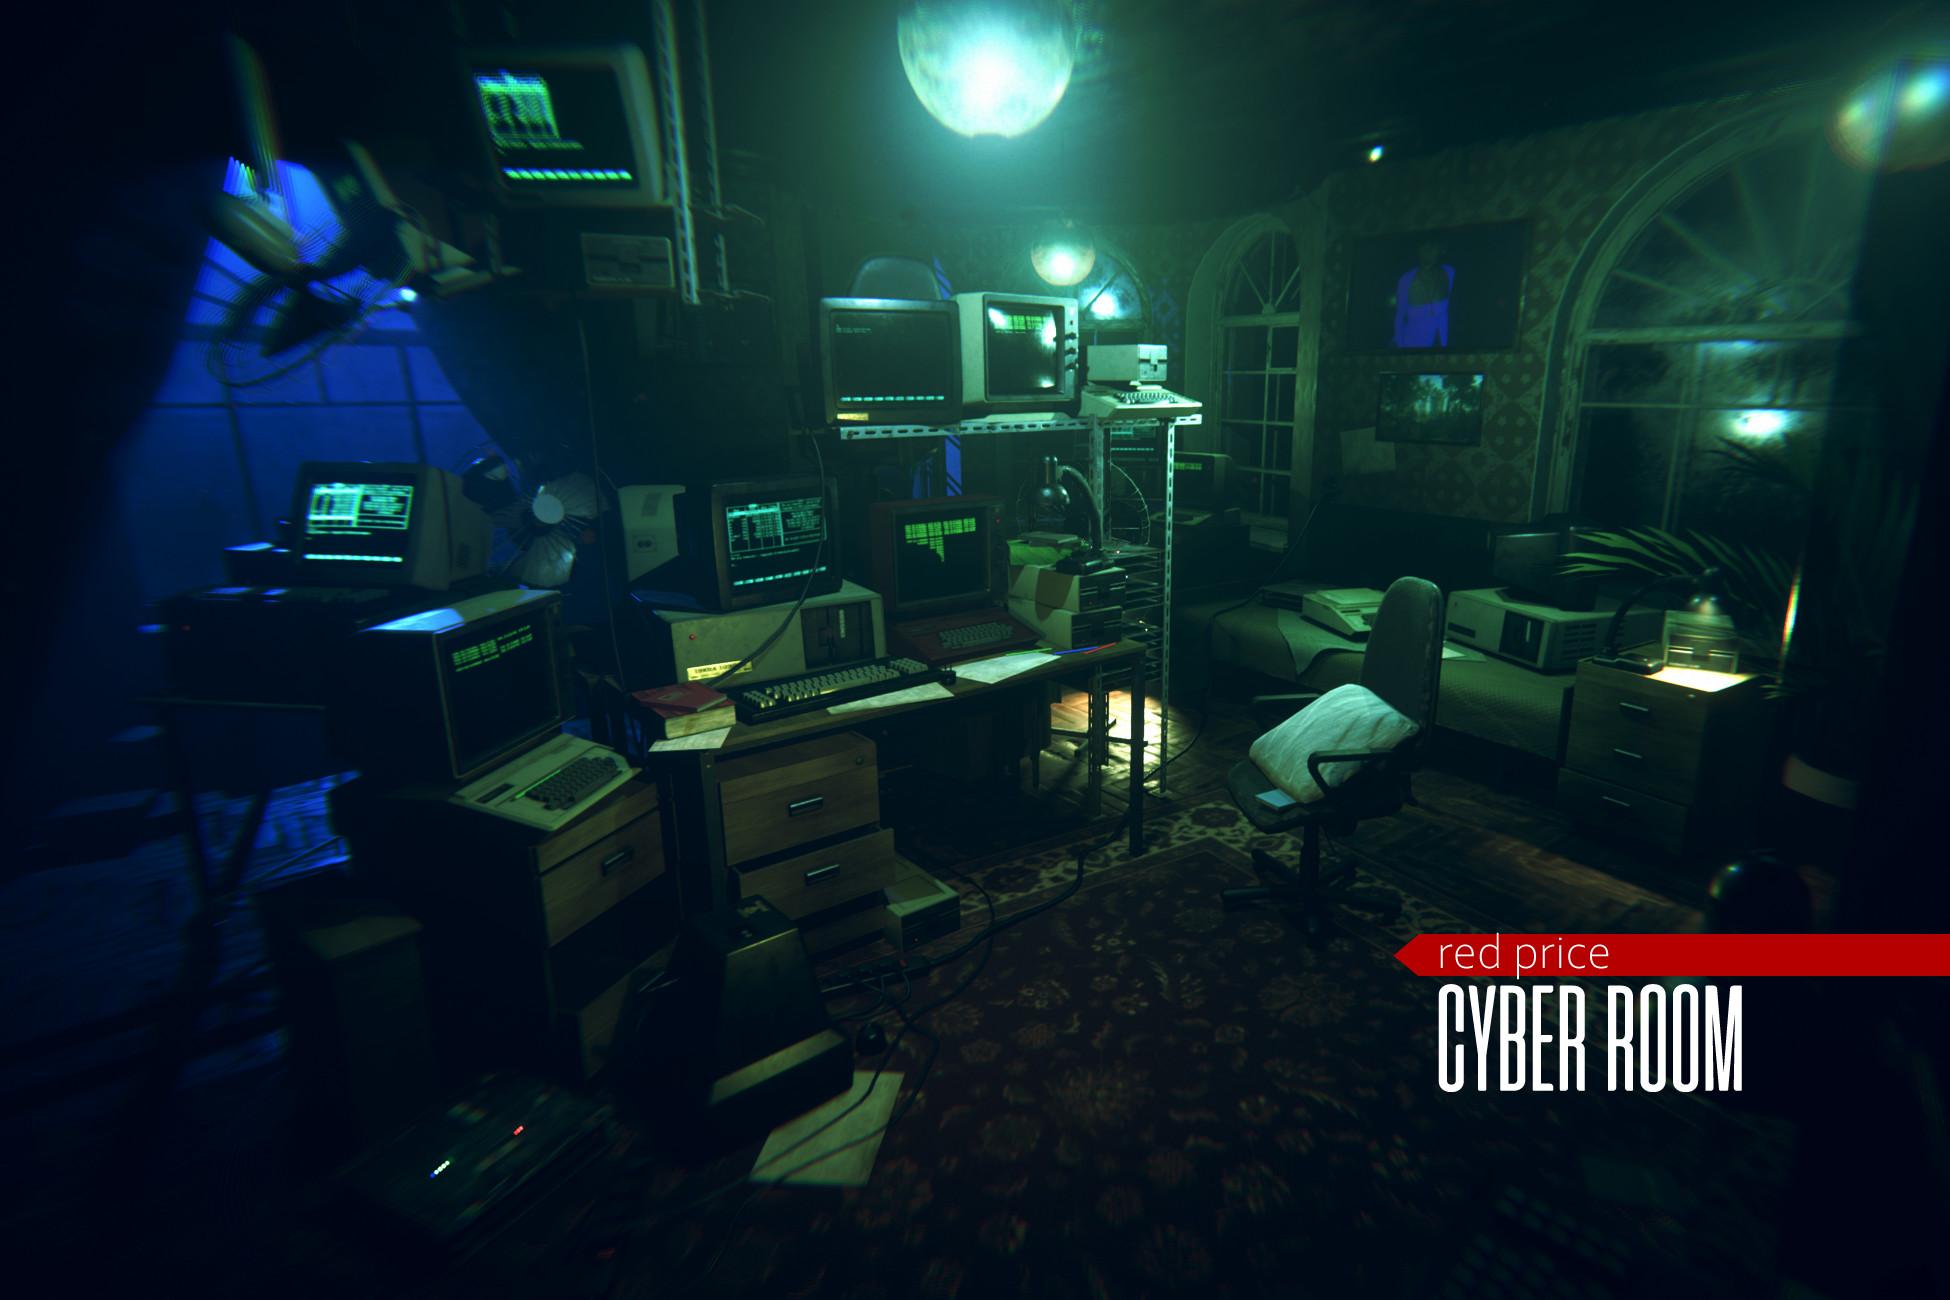 cyberpunk - Cyber Room